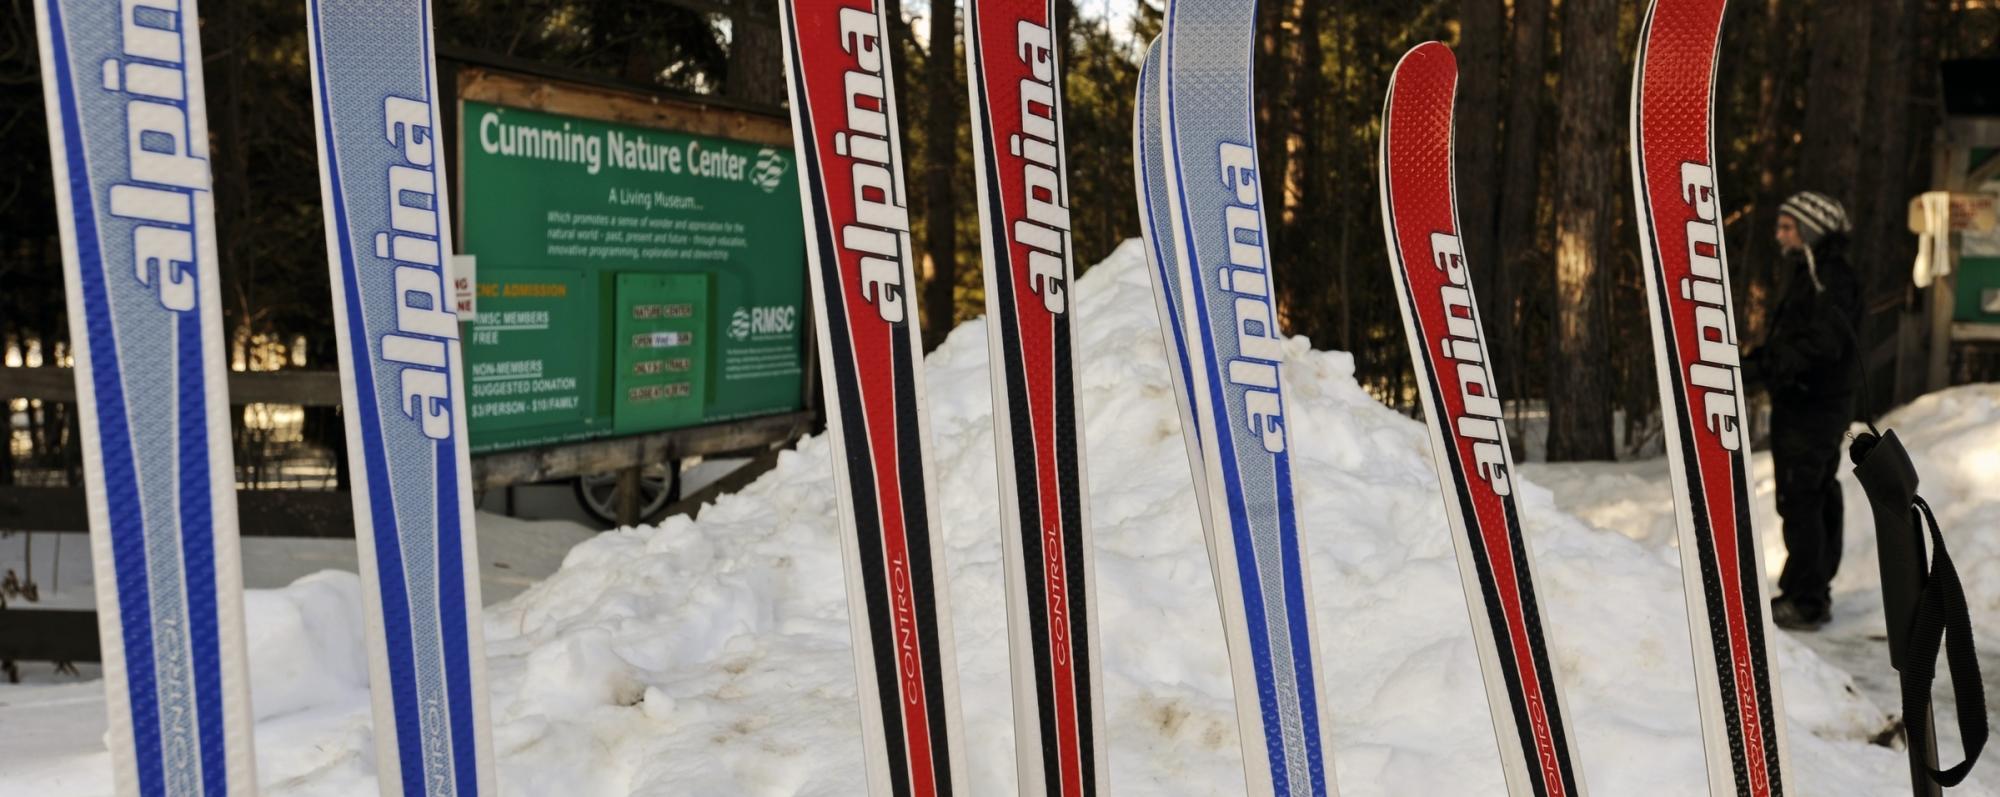 Seasons Winter - Skijoring